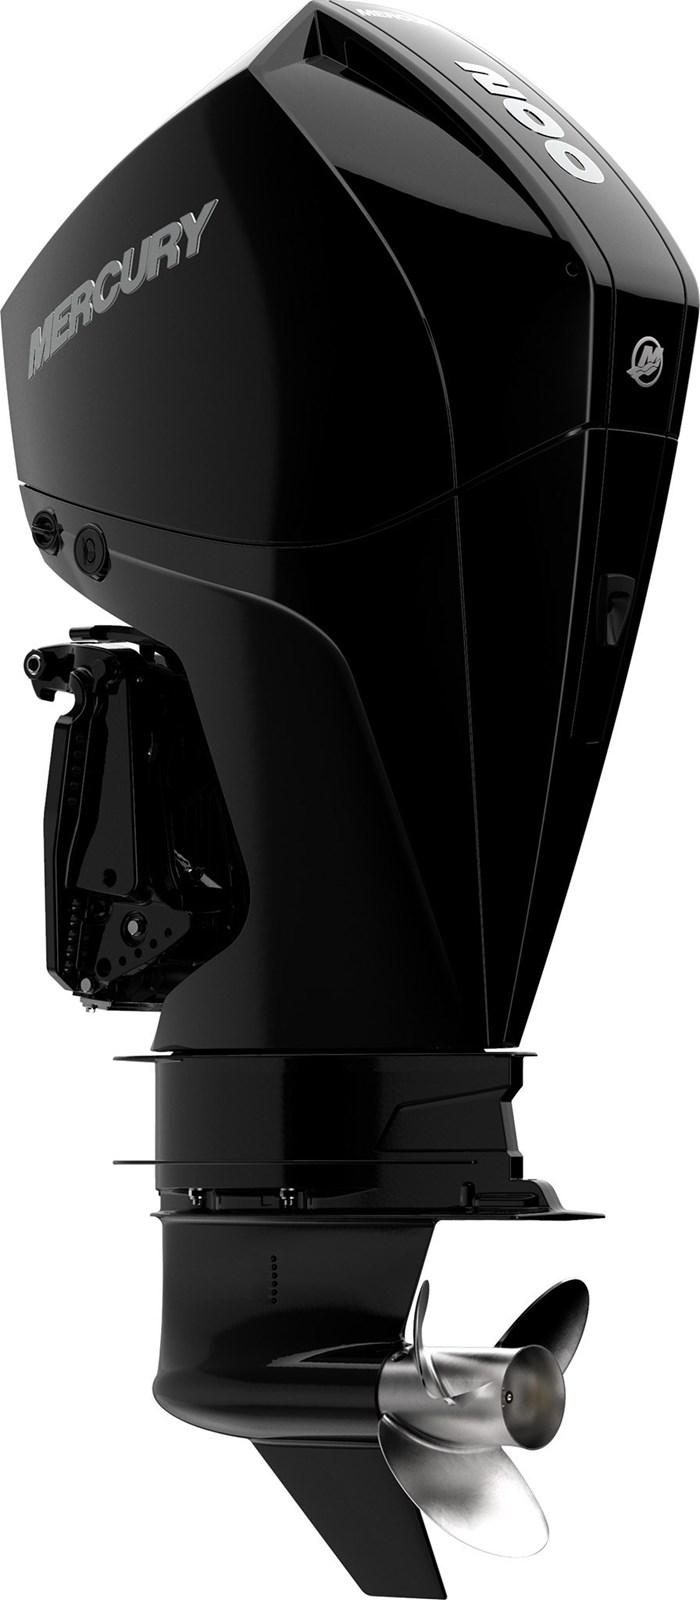 2021 Mercury 200XL V-6 4-Stroke DTS Photo 9 of 23